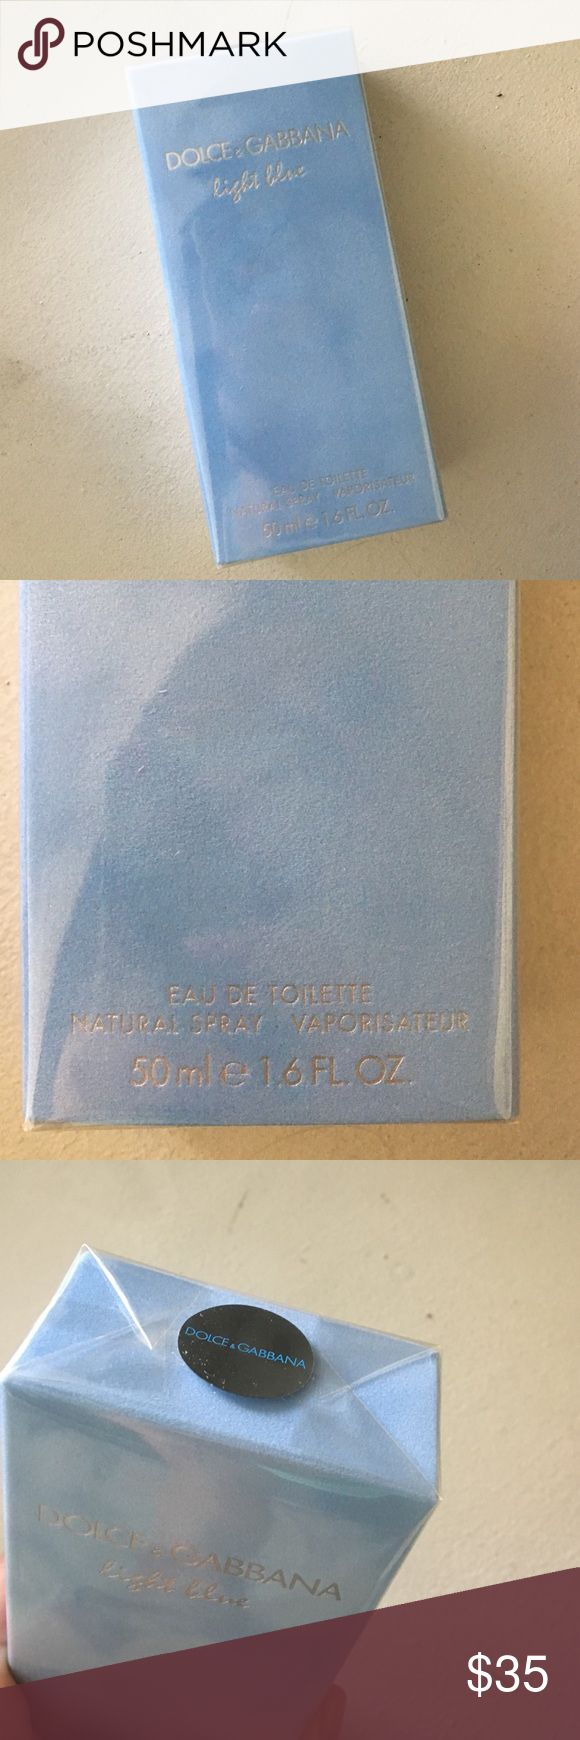 Dolce & Gabbana Light Blue perfume Brand new in wrapper D&G perfume light blue 50ml 1.6fl oz. Dolce & Gabbana Accessories